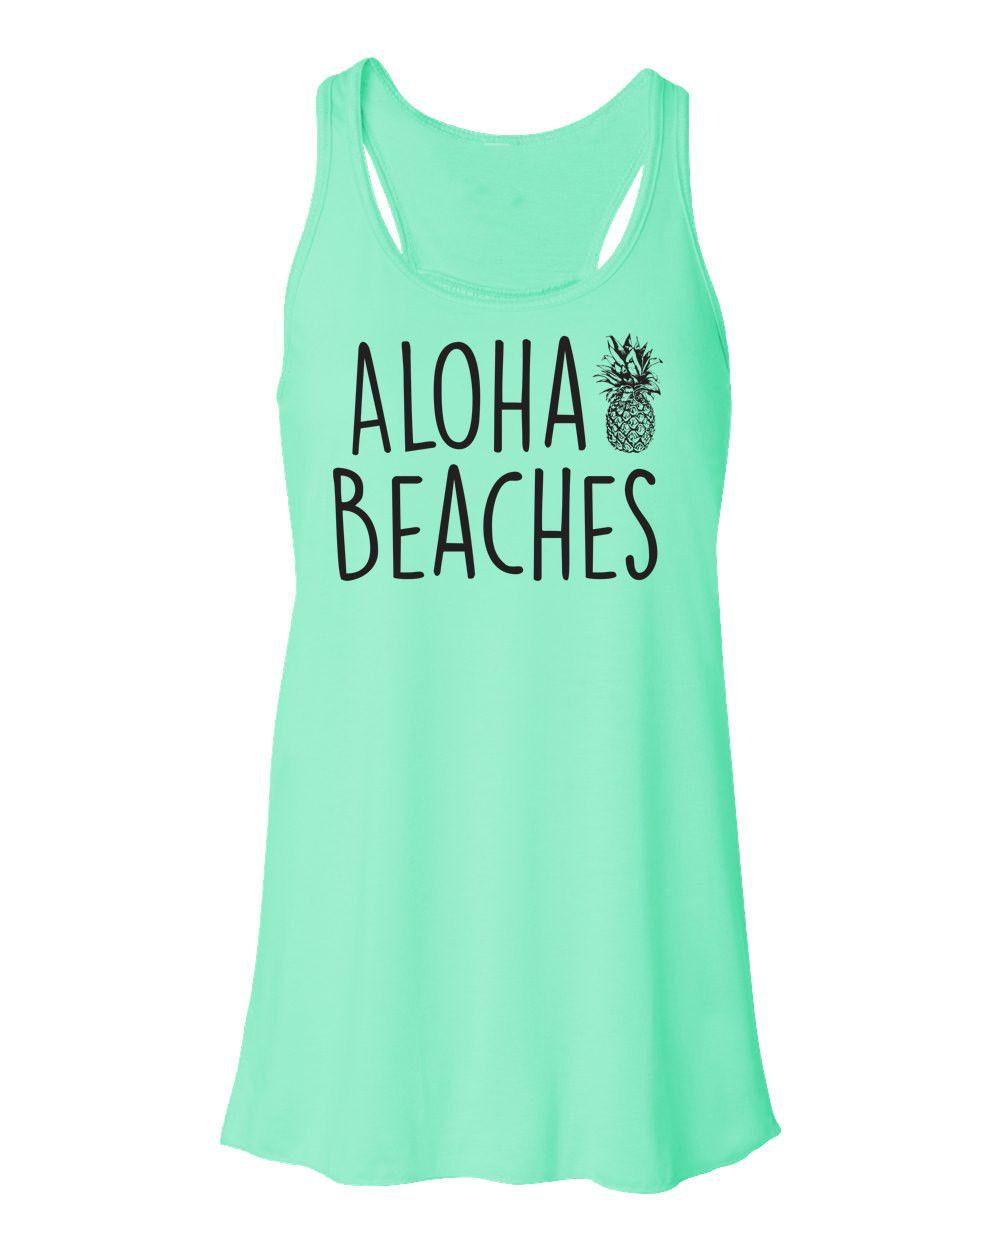 2f0e8d3bf2 Beach Tank Top. Flowy Tank Top. Aloha Beaches Shirt. Mermaid Tank.  Pineapple Tank. Beach Please. Mermaid Top. Vacation Top.